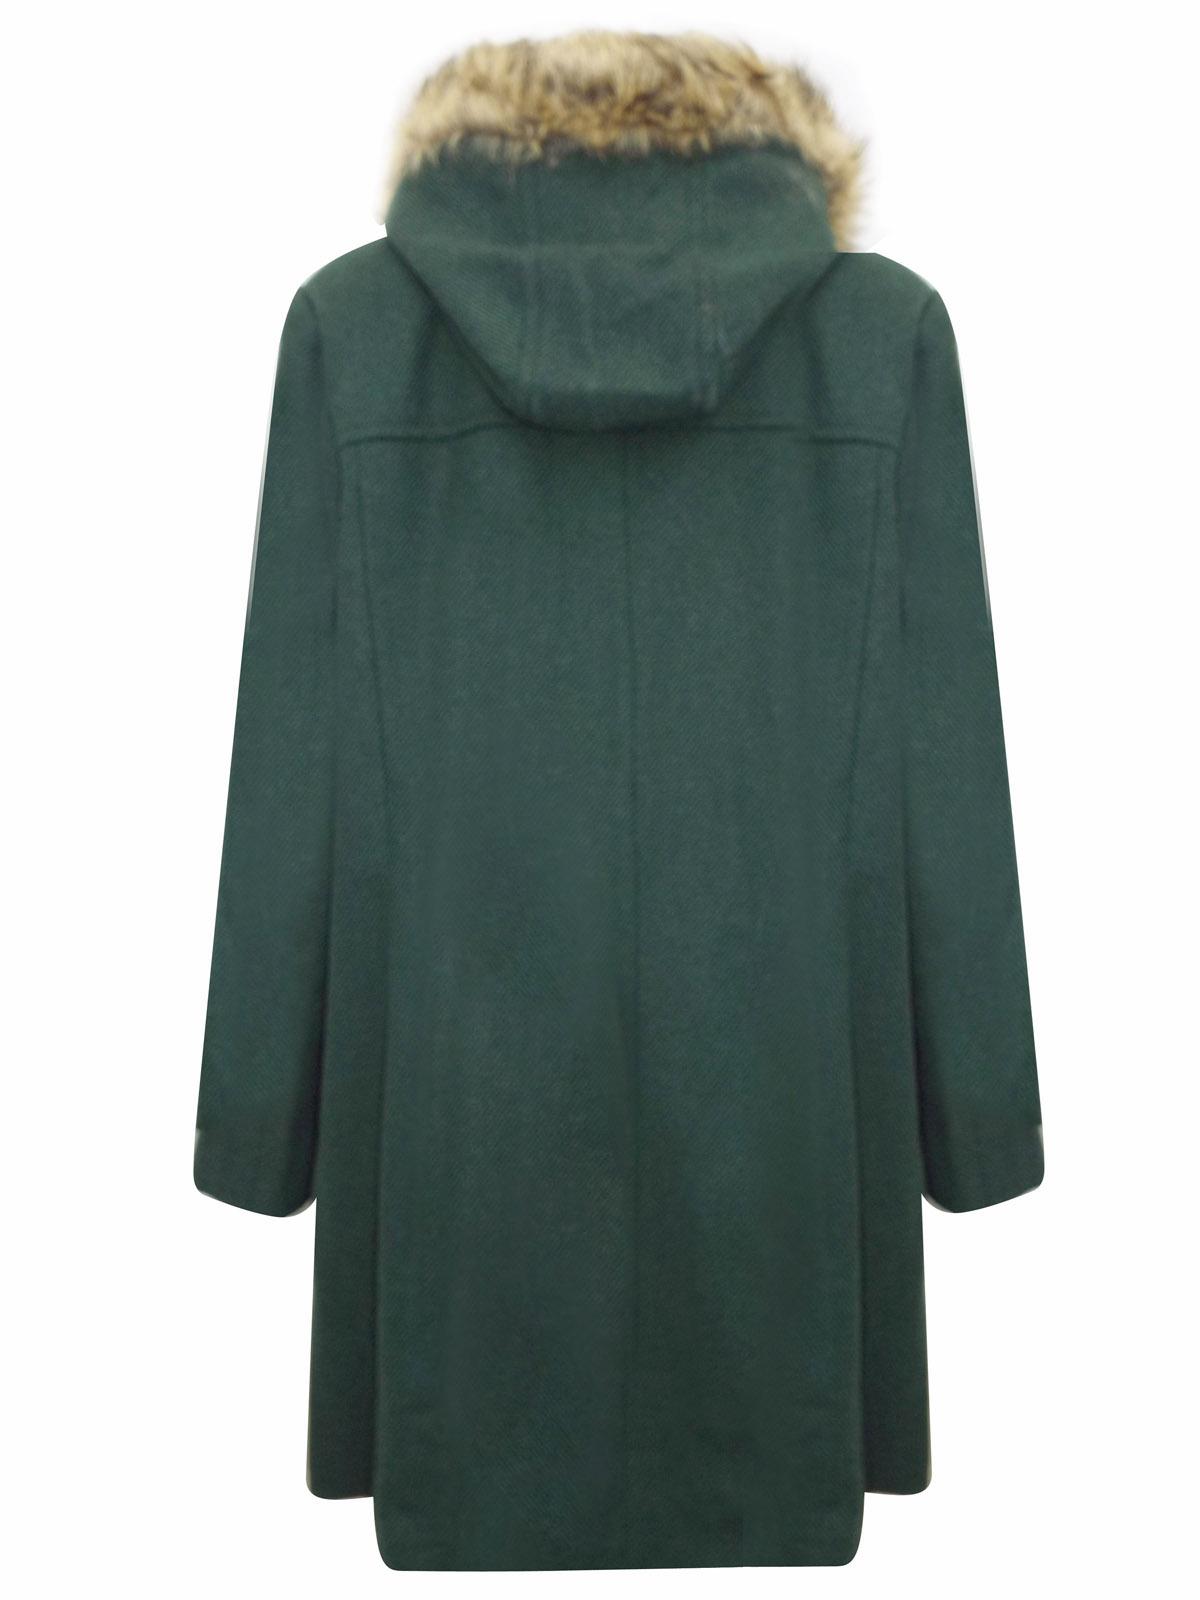 GREEN Fur Hood Twill Duffle Coat Plus